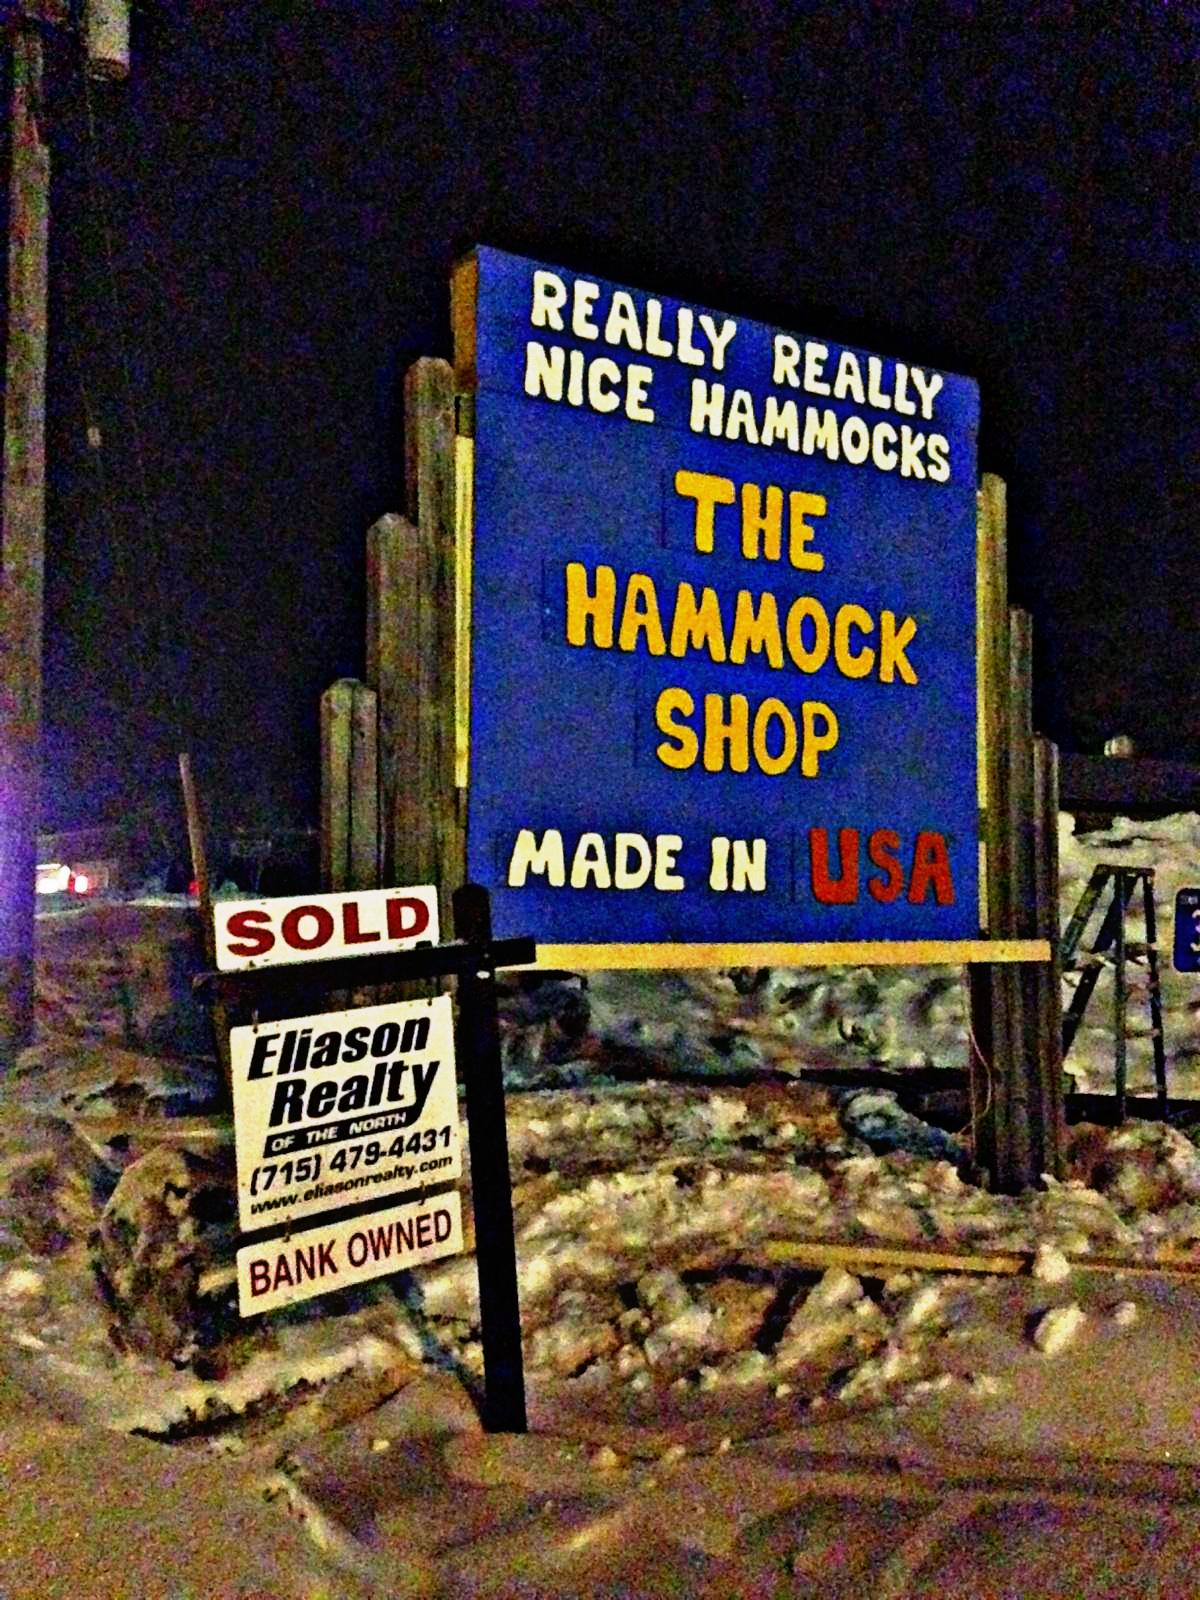 Hammock-shop-sold-sign-st-germain-wi